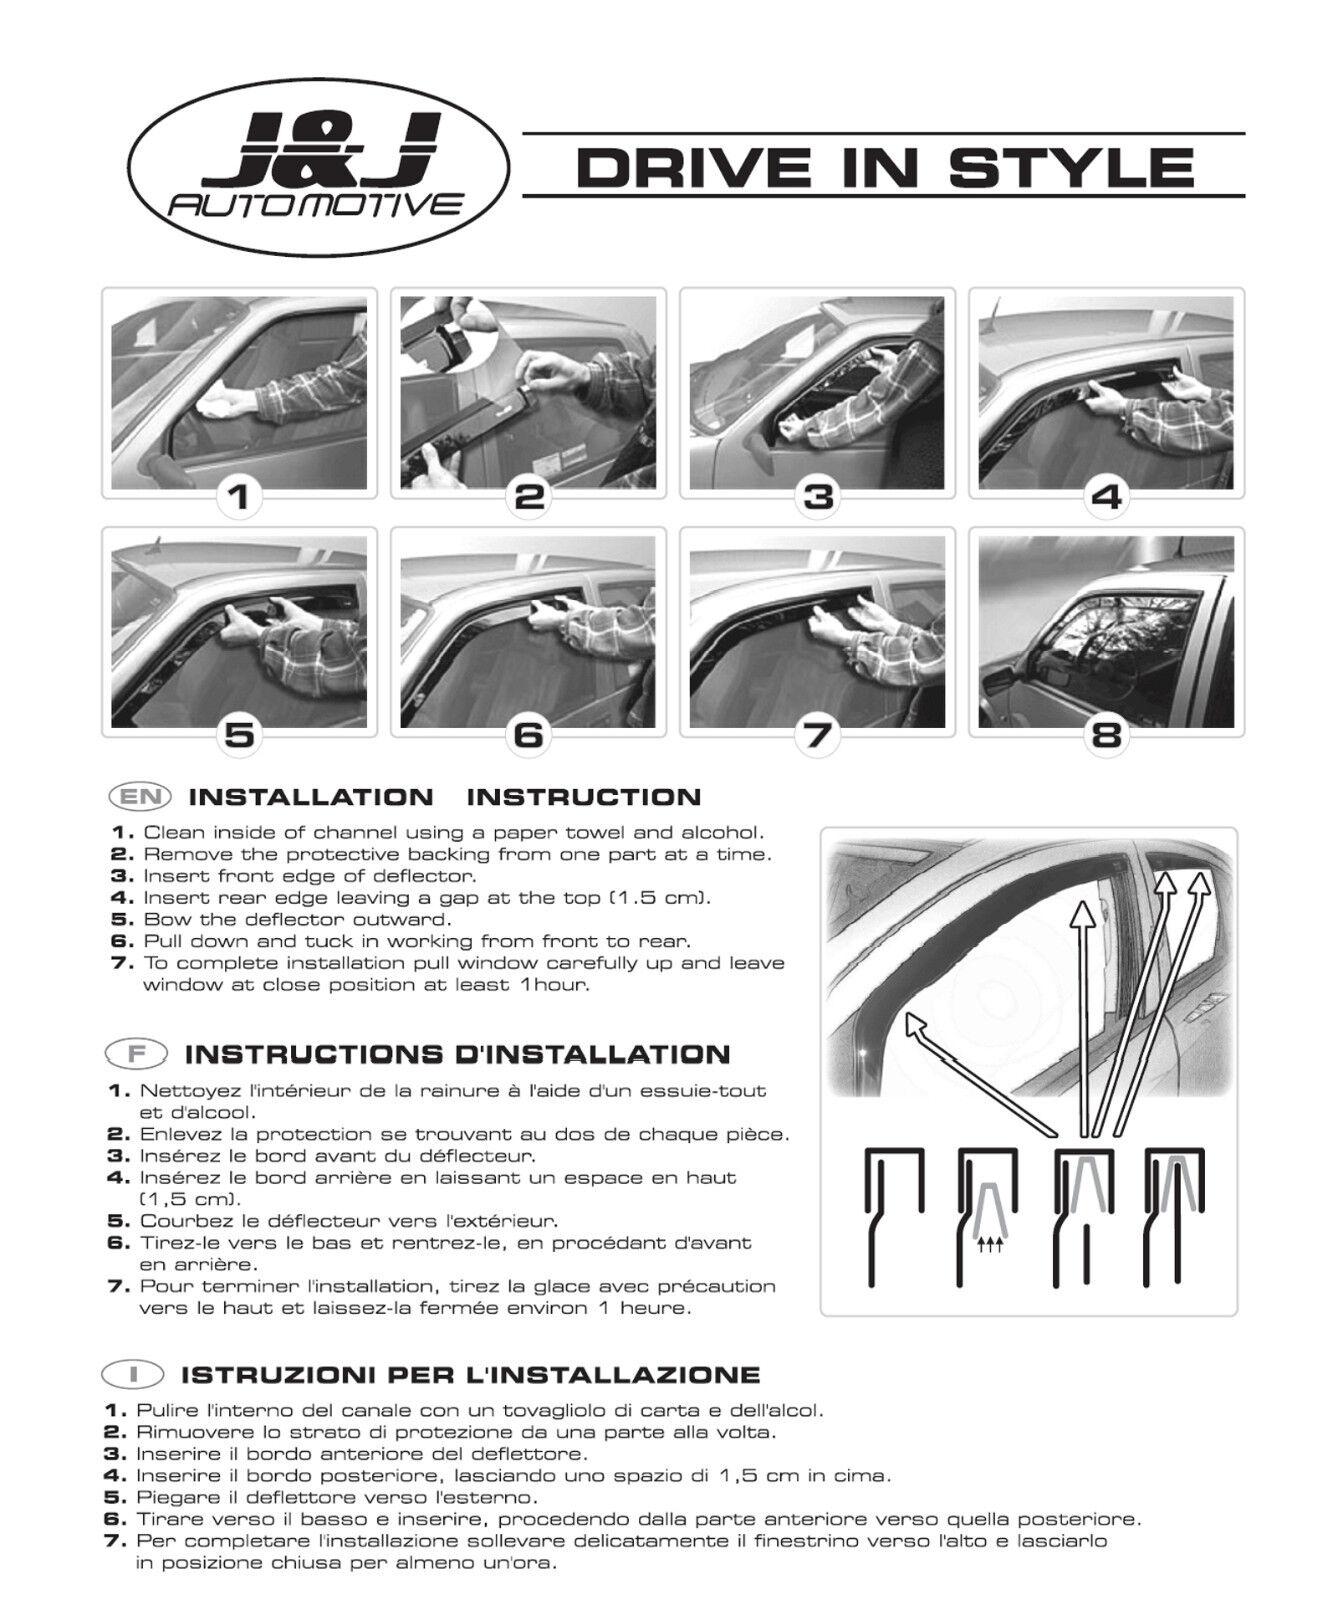 Conjunto de 1999-2005 2pc desviadores de viento frontal teñido Heko para VW Lupo 3 puertas